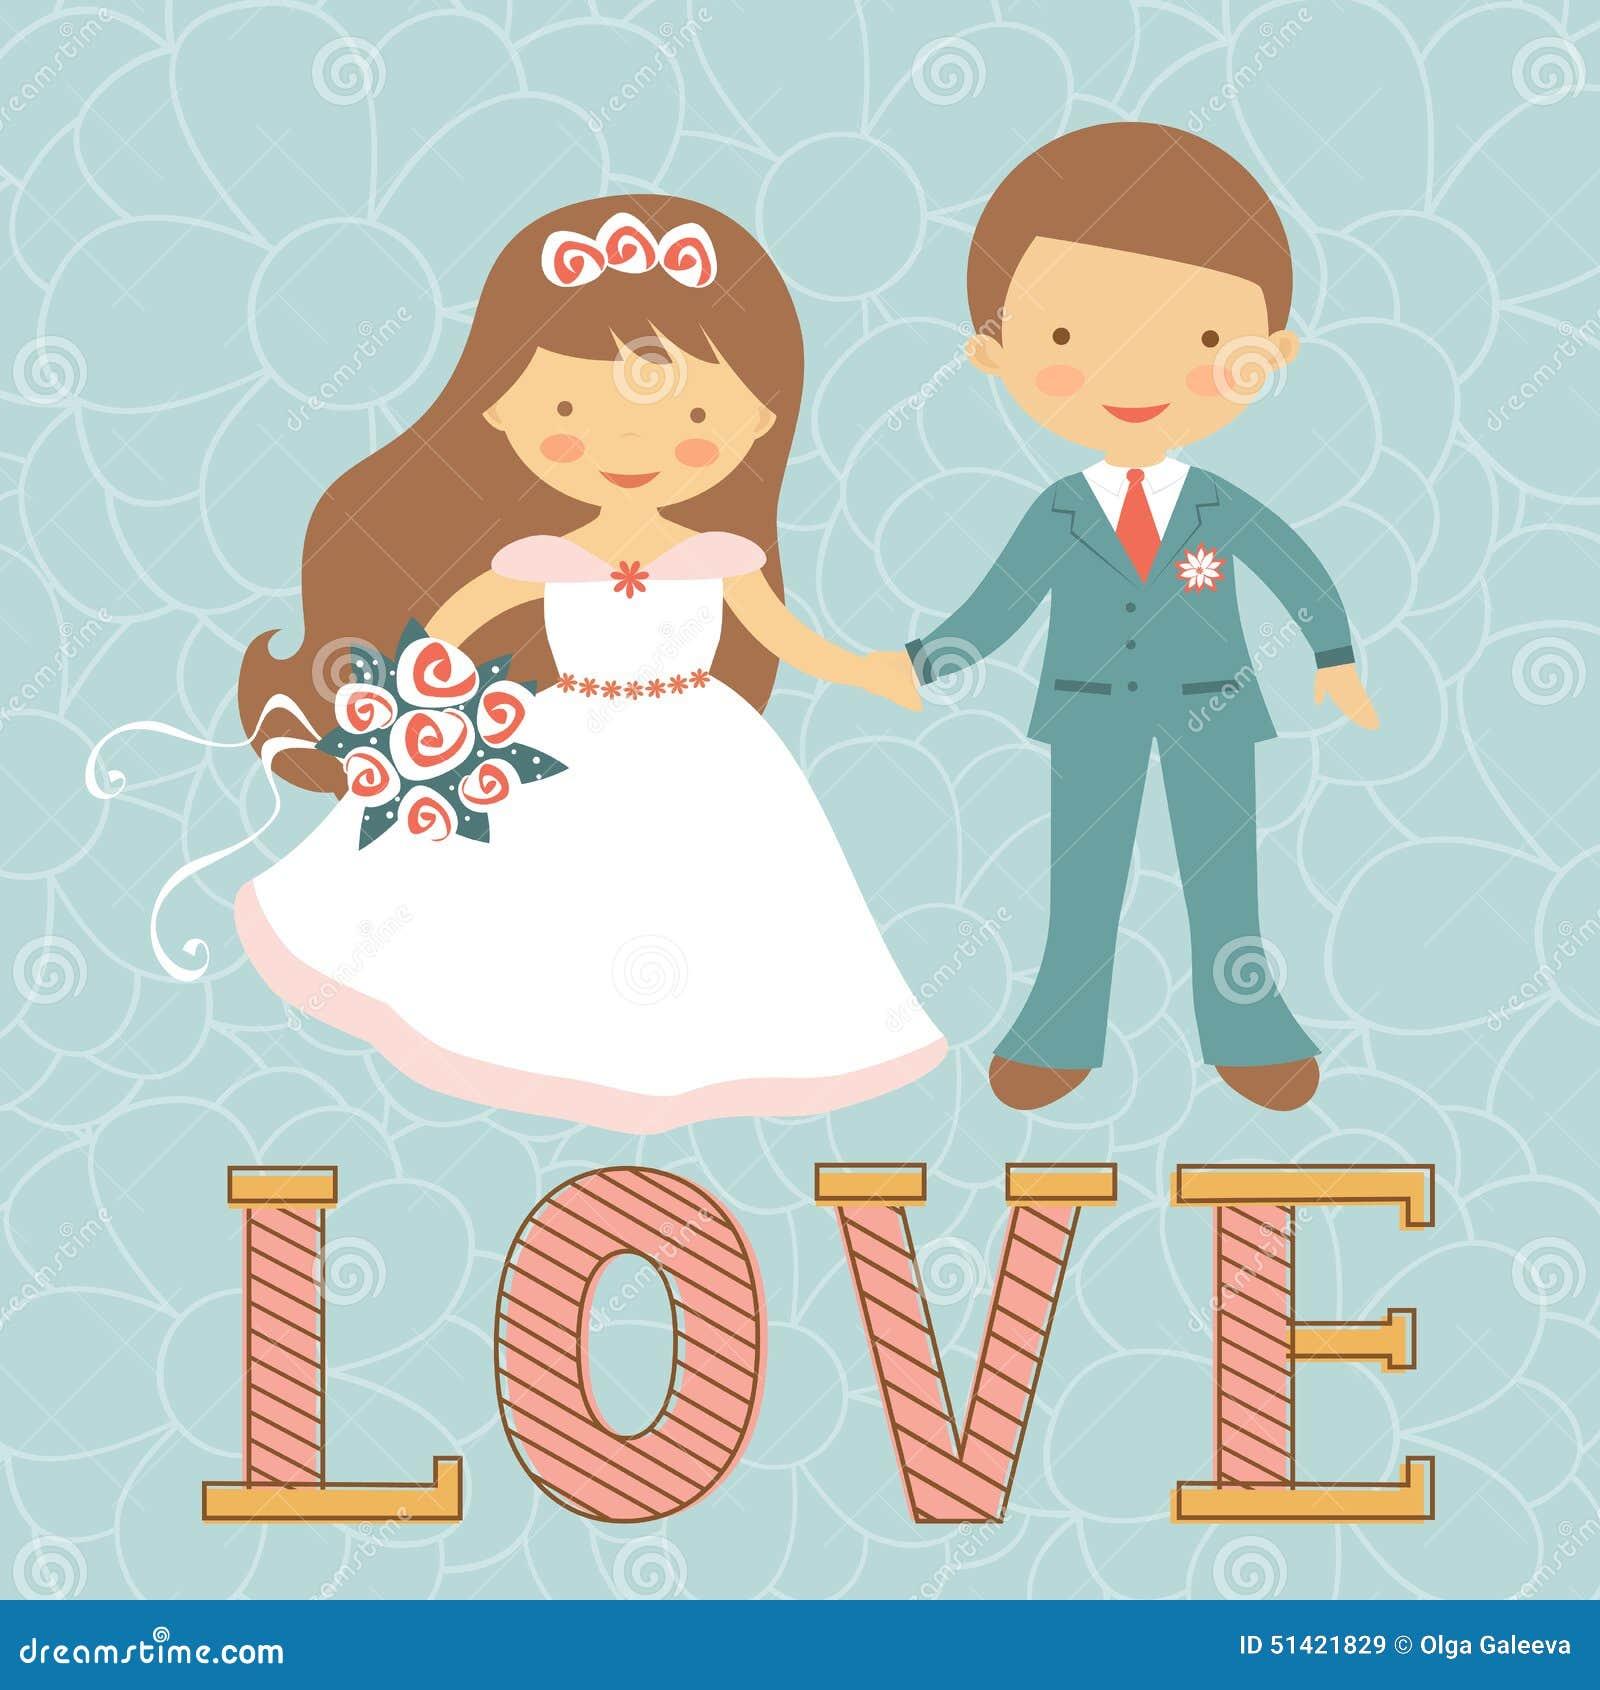 Cute Wedding Couple Stock Vector - Image: 51421829